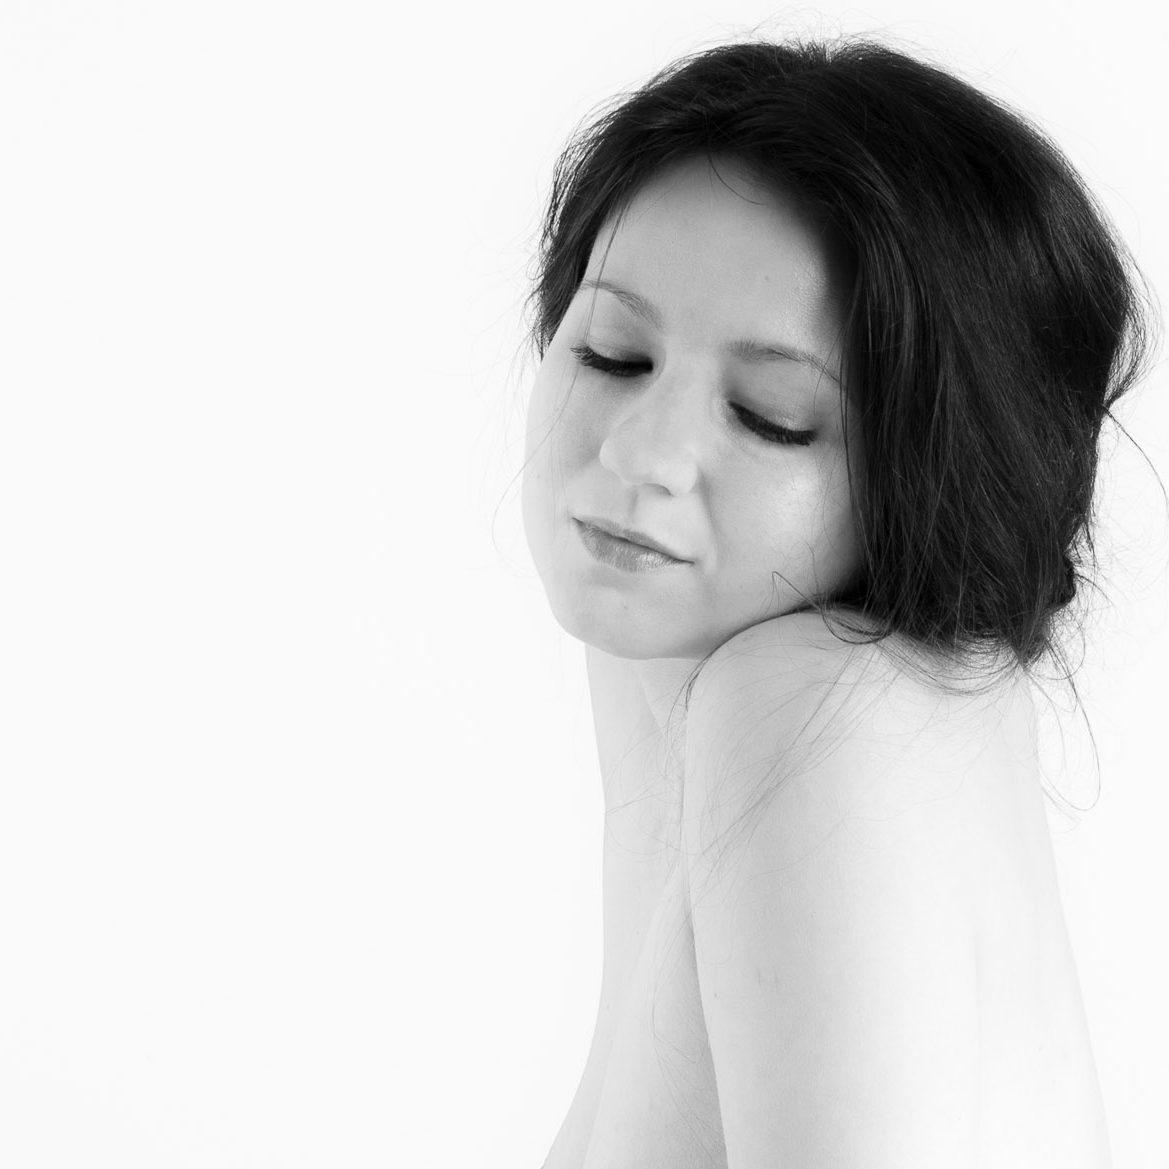 Alexandra T. – Portrait #3